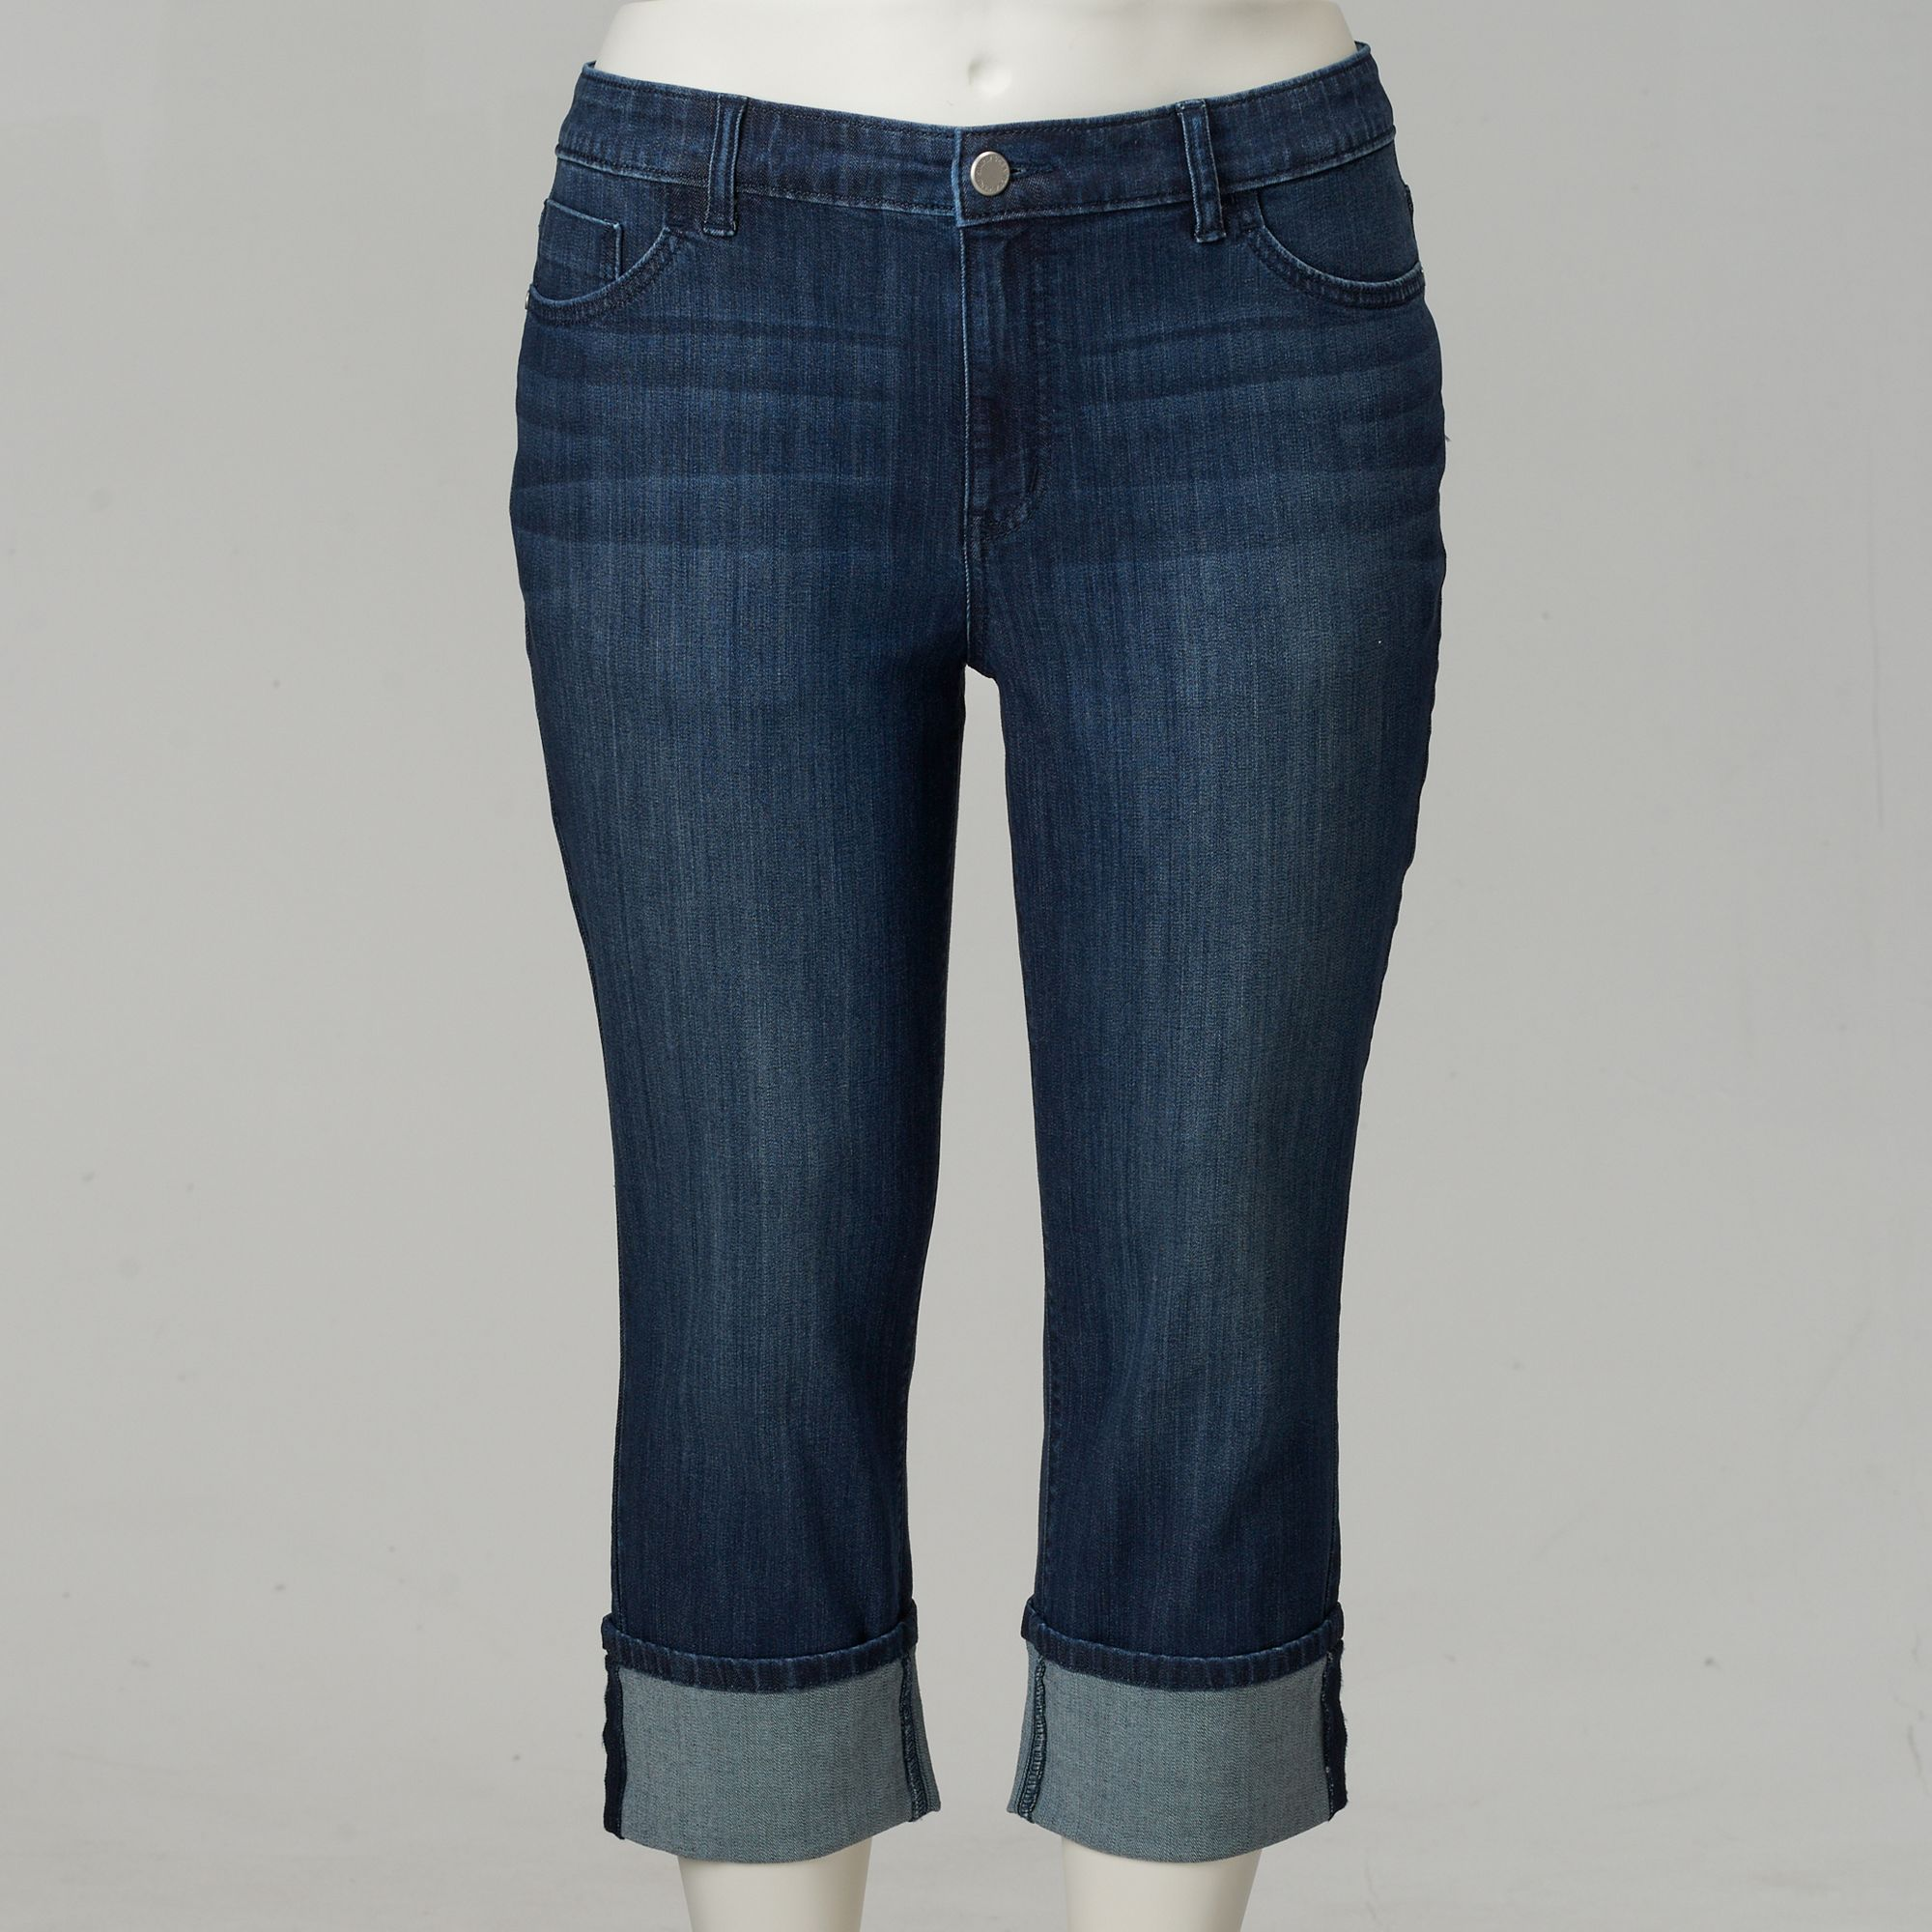 a0f4ce4e85faa Women's Plus Size Simply Vera Vera Wang Cuffed Capri Jeans, Size: 18 W,  Blue (Navy)